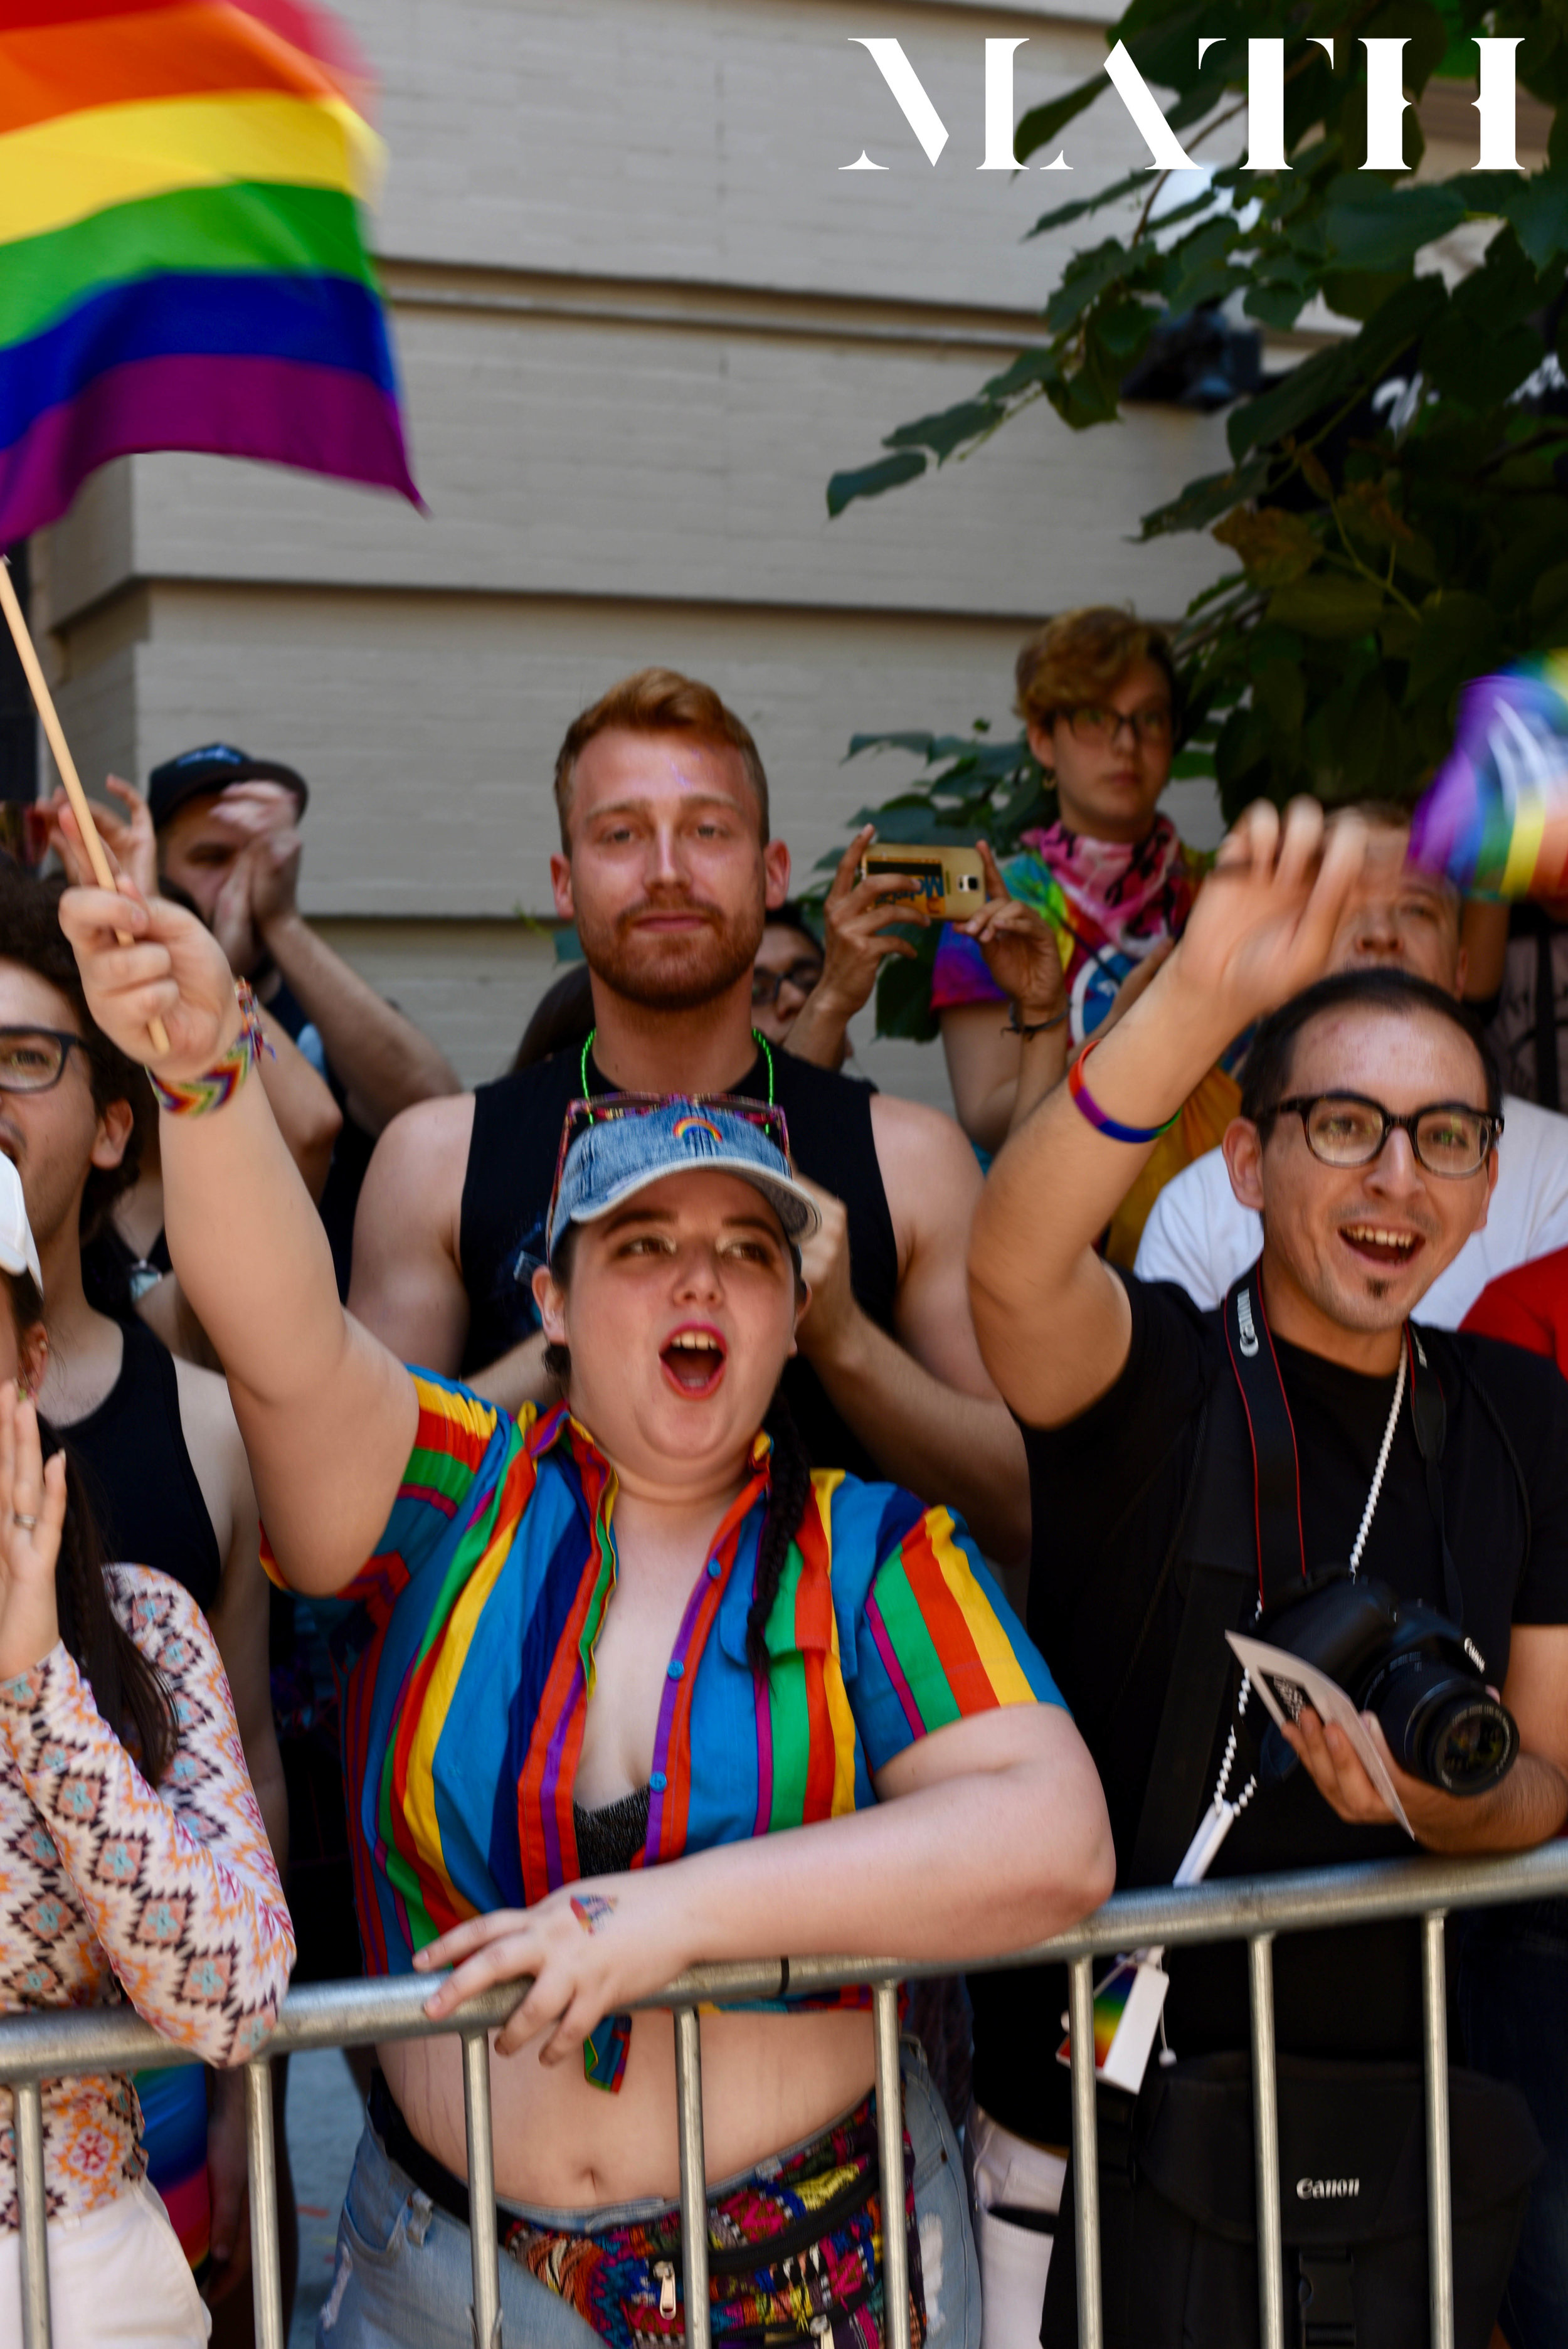 NYC Pride_Ginger Hollander 6.jpg